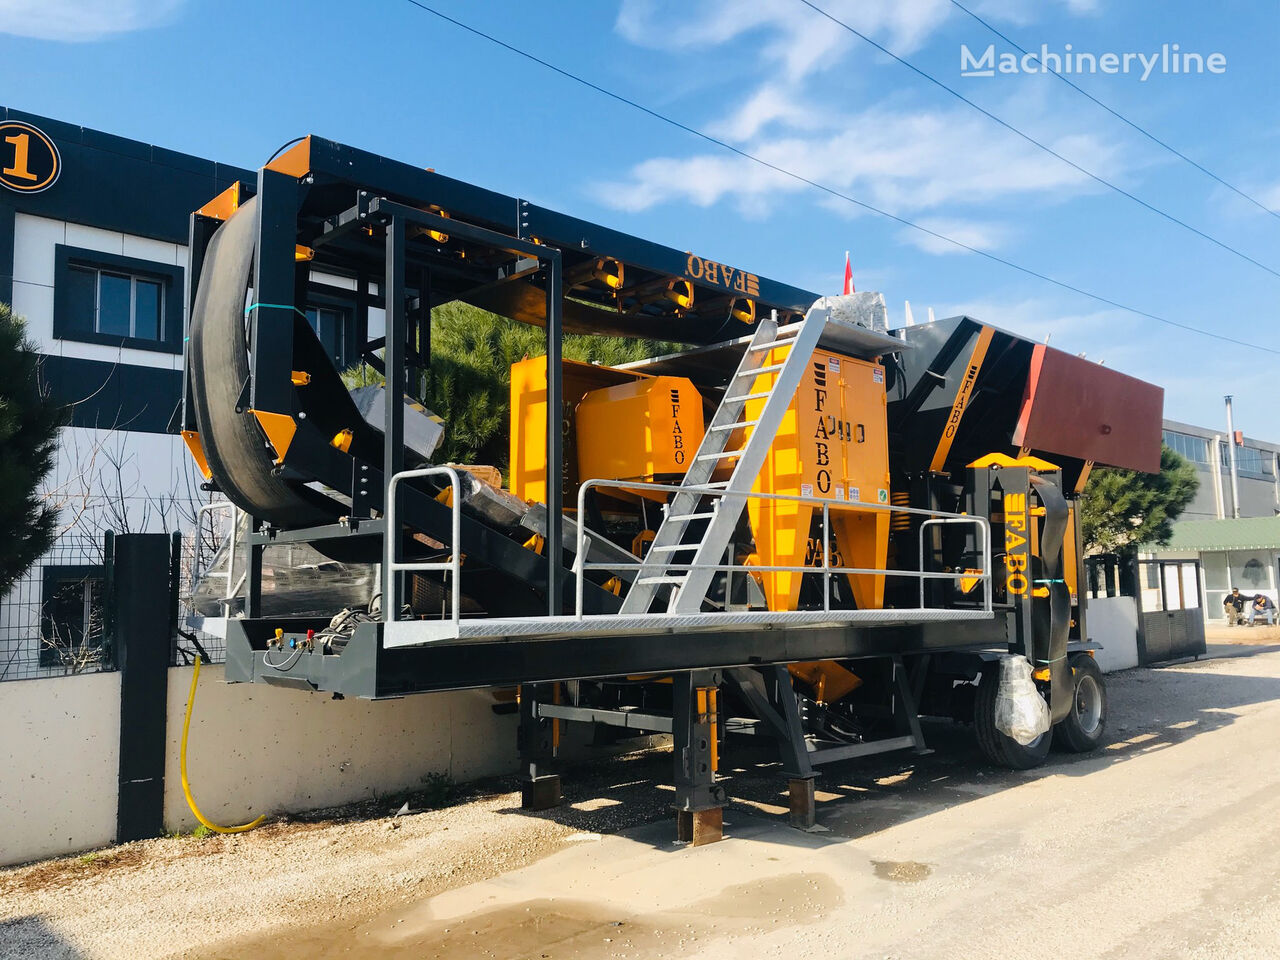 new FABO MJK-90 SERIES 100-200 TPH MOBILE JAW CRUSHER PLANT mobile crushing plant